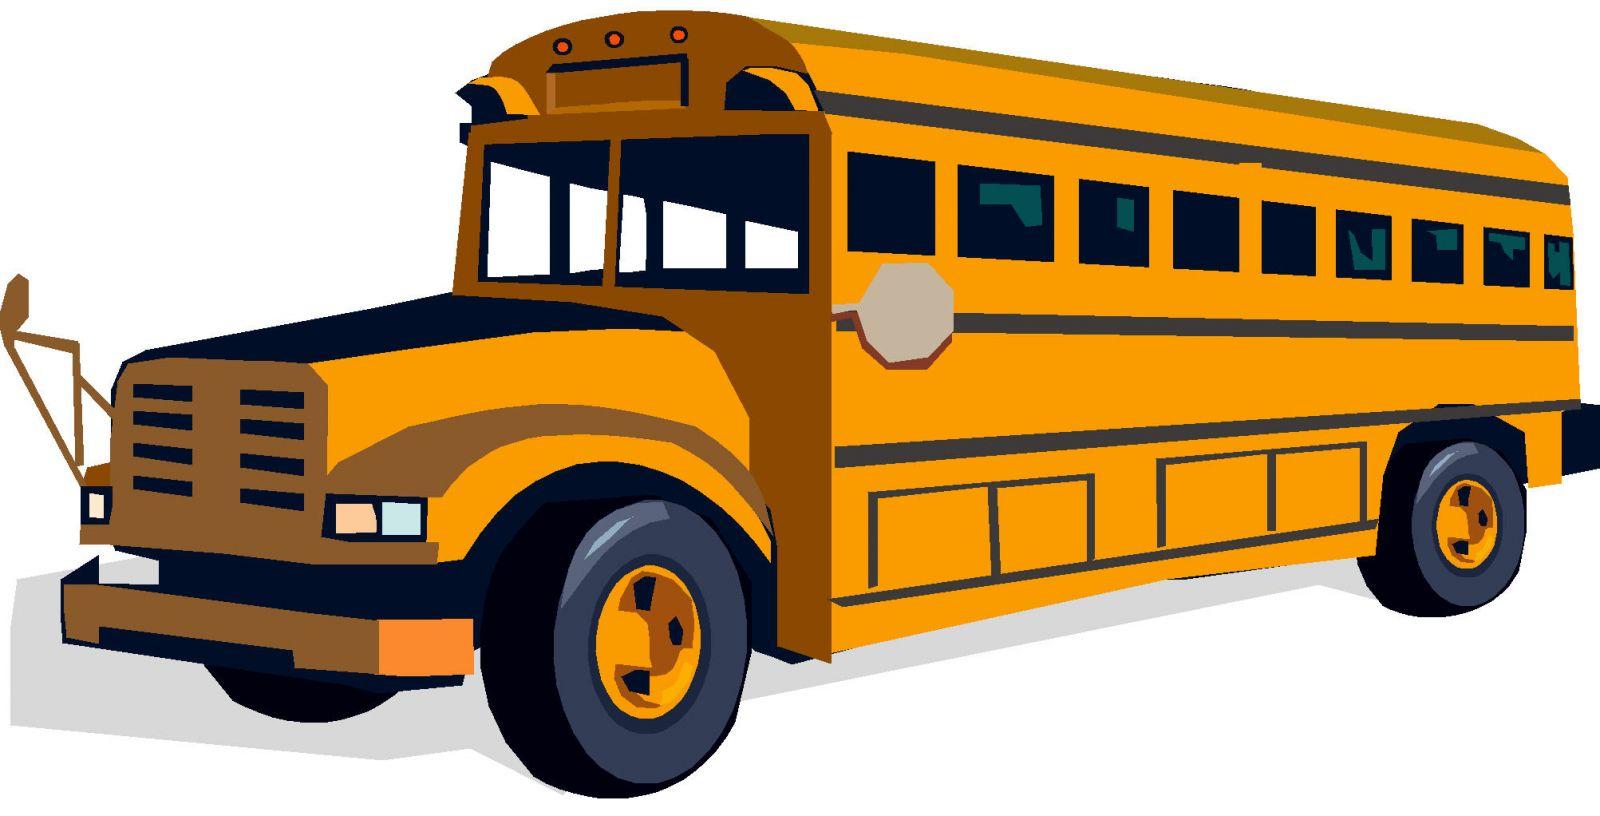 School bus clip art bing images for Clipart bus